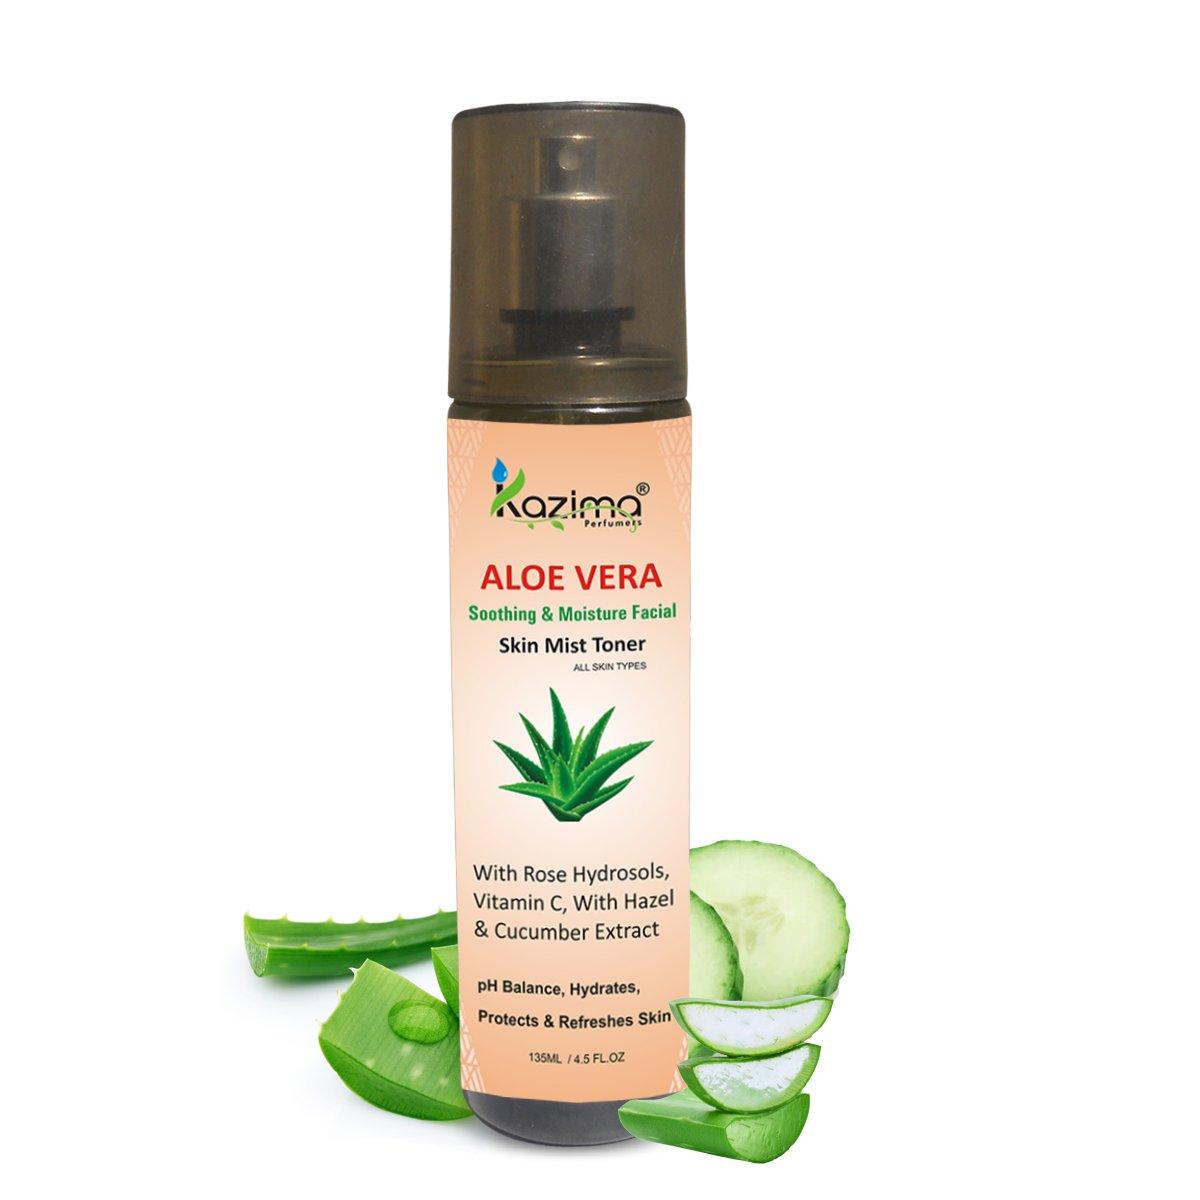 Aloe Vera Soothing & Moisture Facial Skin Mist Toner – (No Sulfate, No Parabens, No Xanthan, No Mineral Oil)